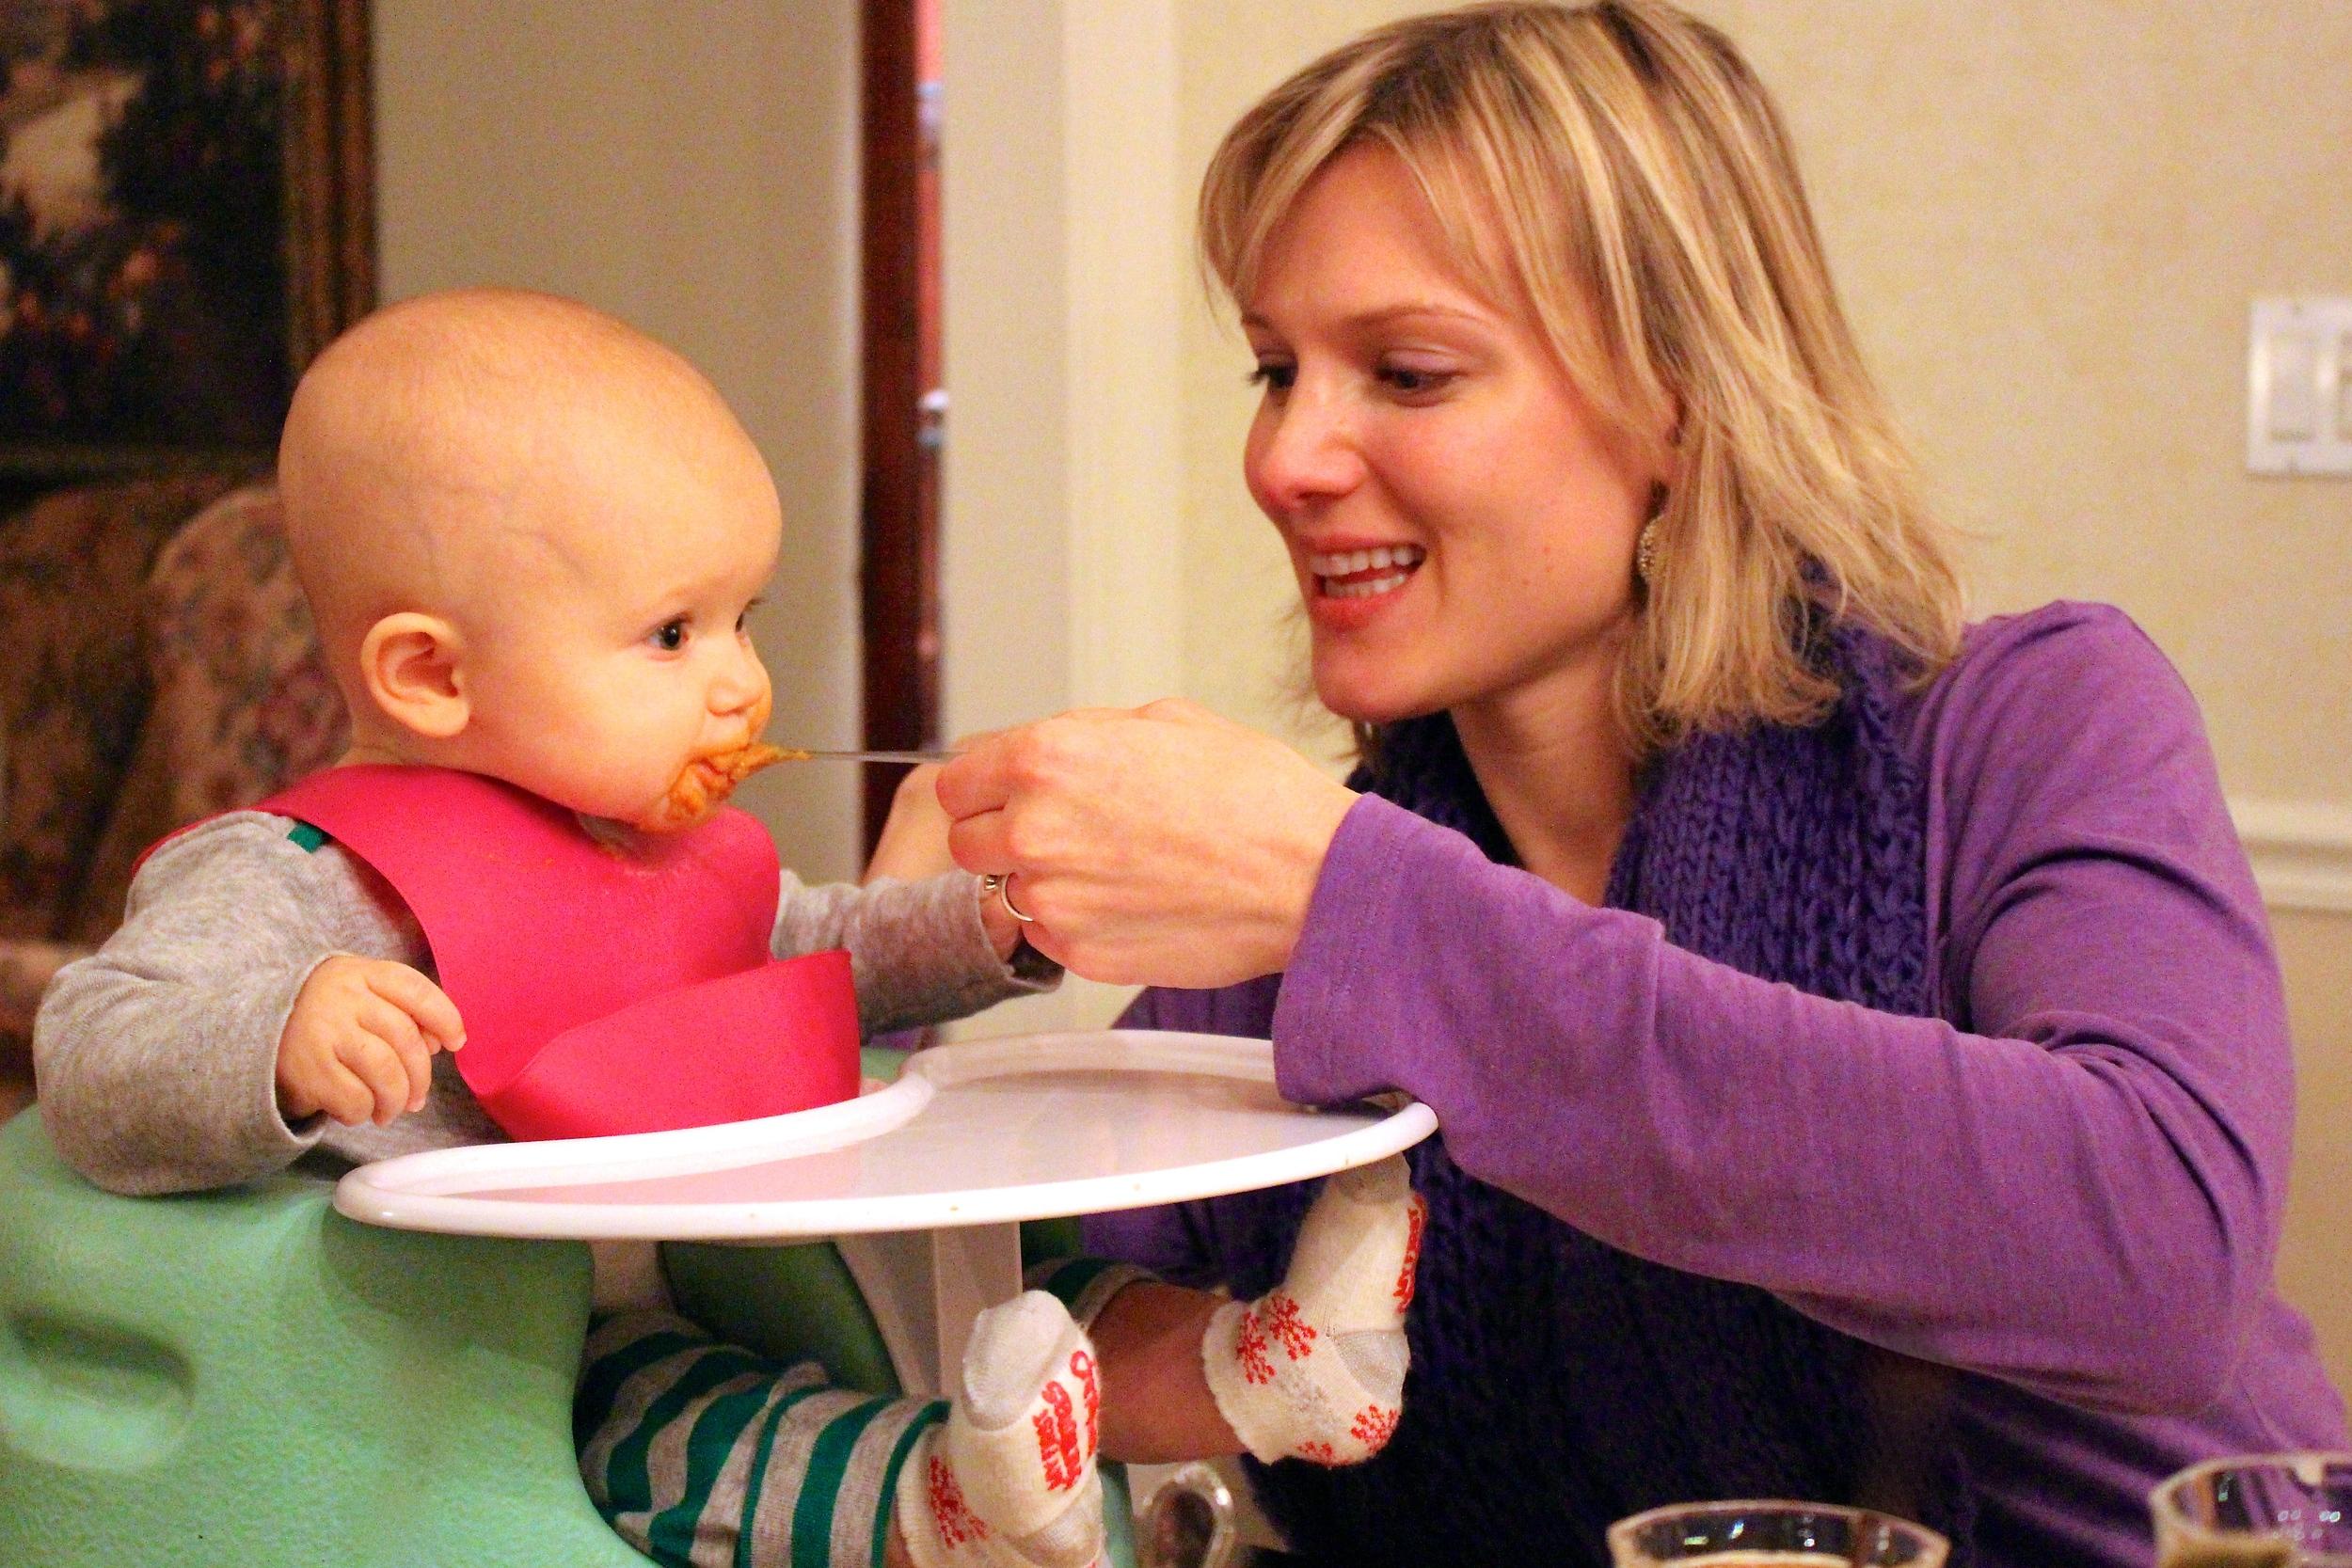 My sister feeding her infant daughter